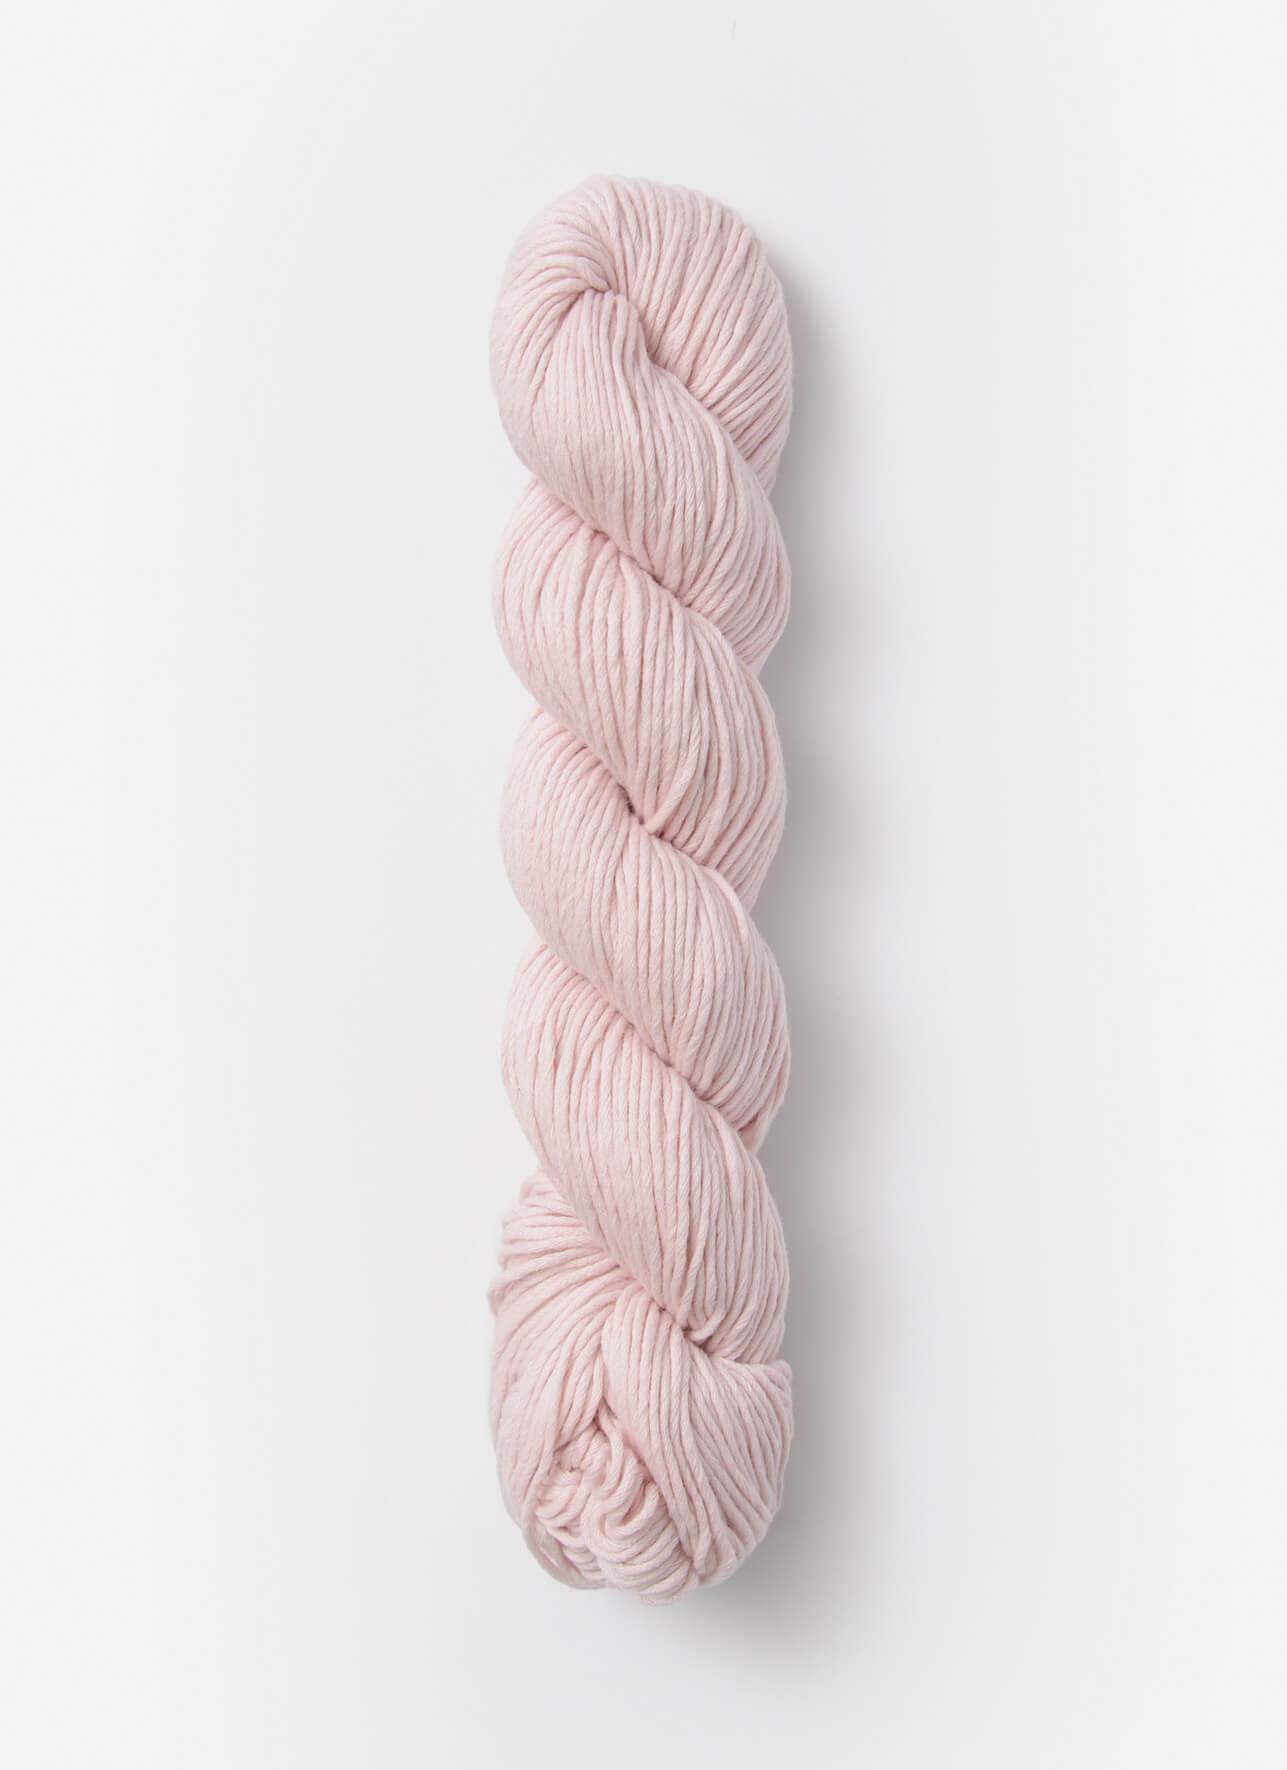 No. 305: Pink